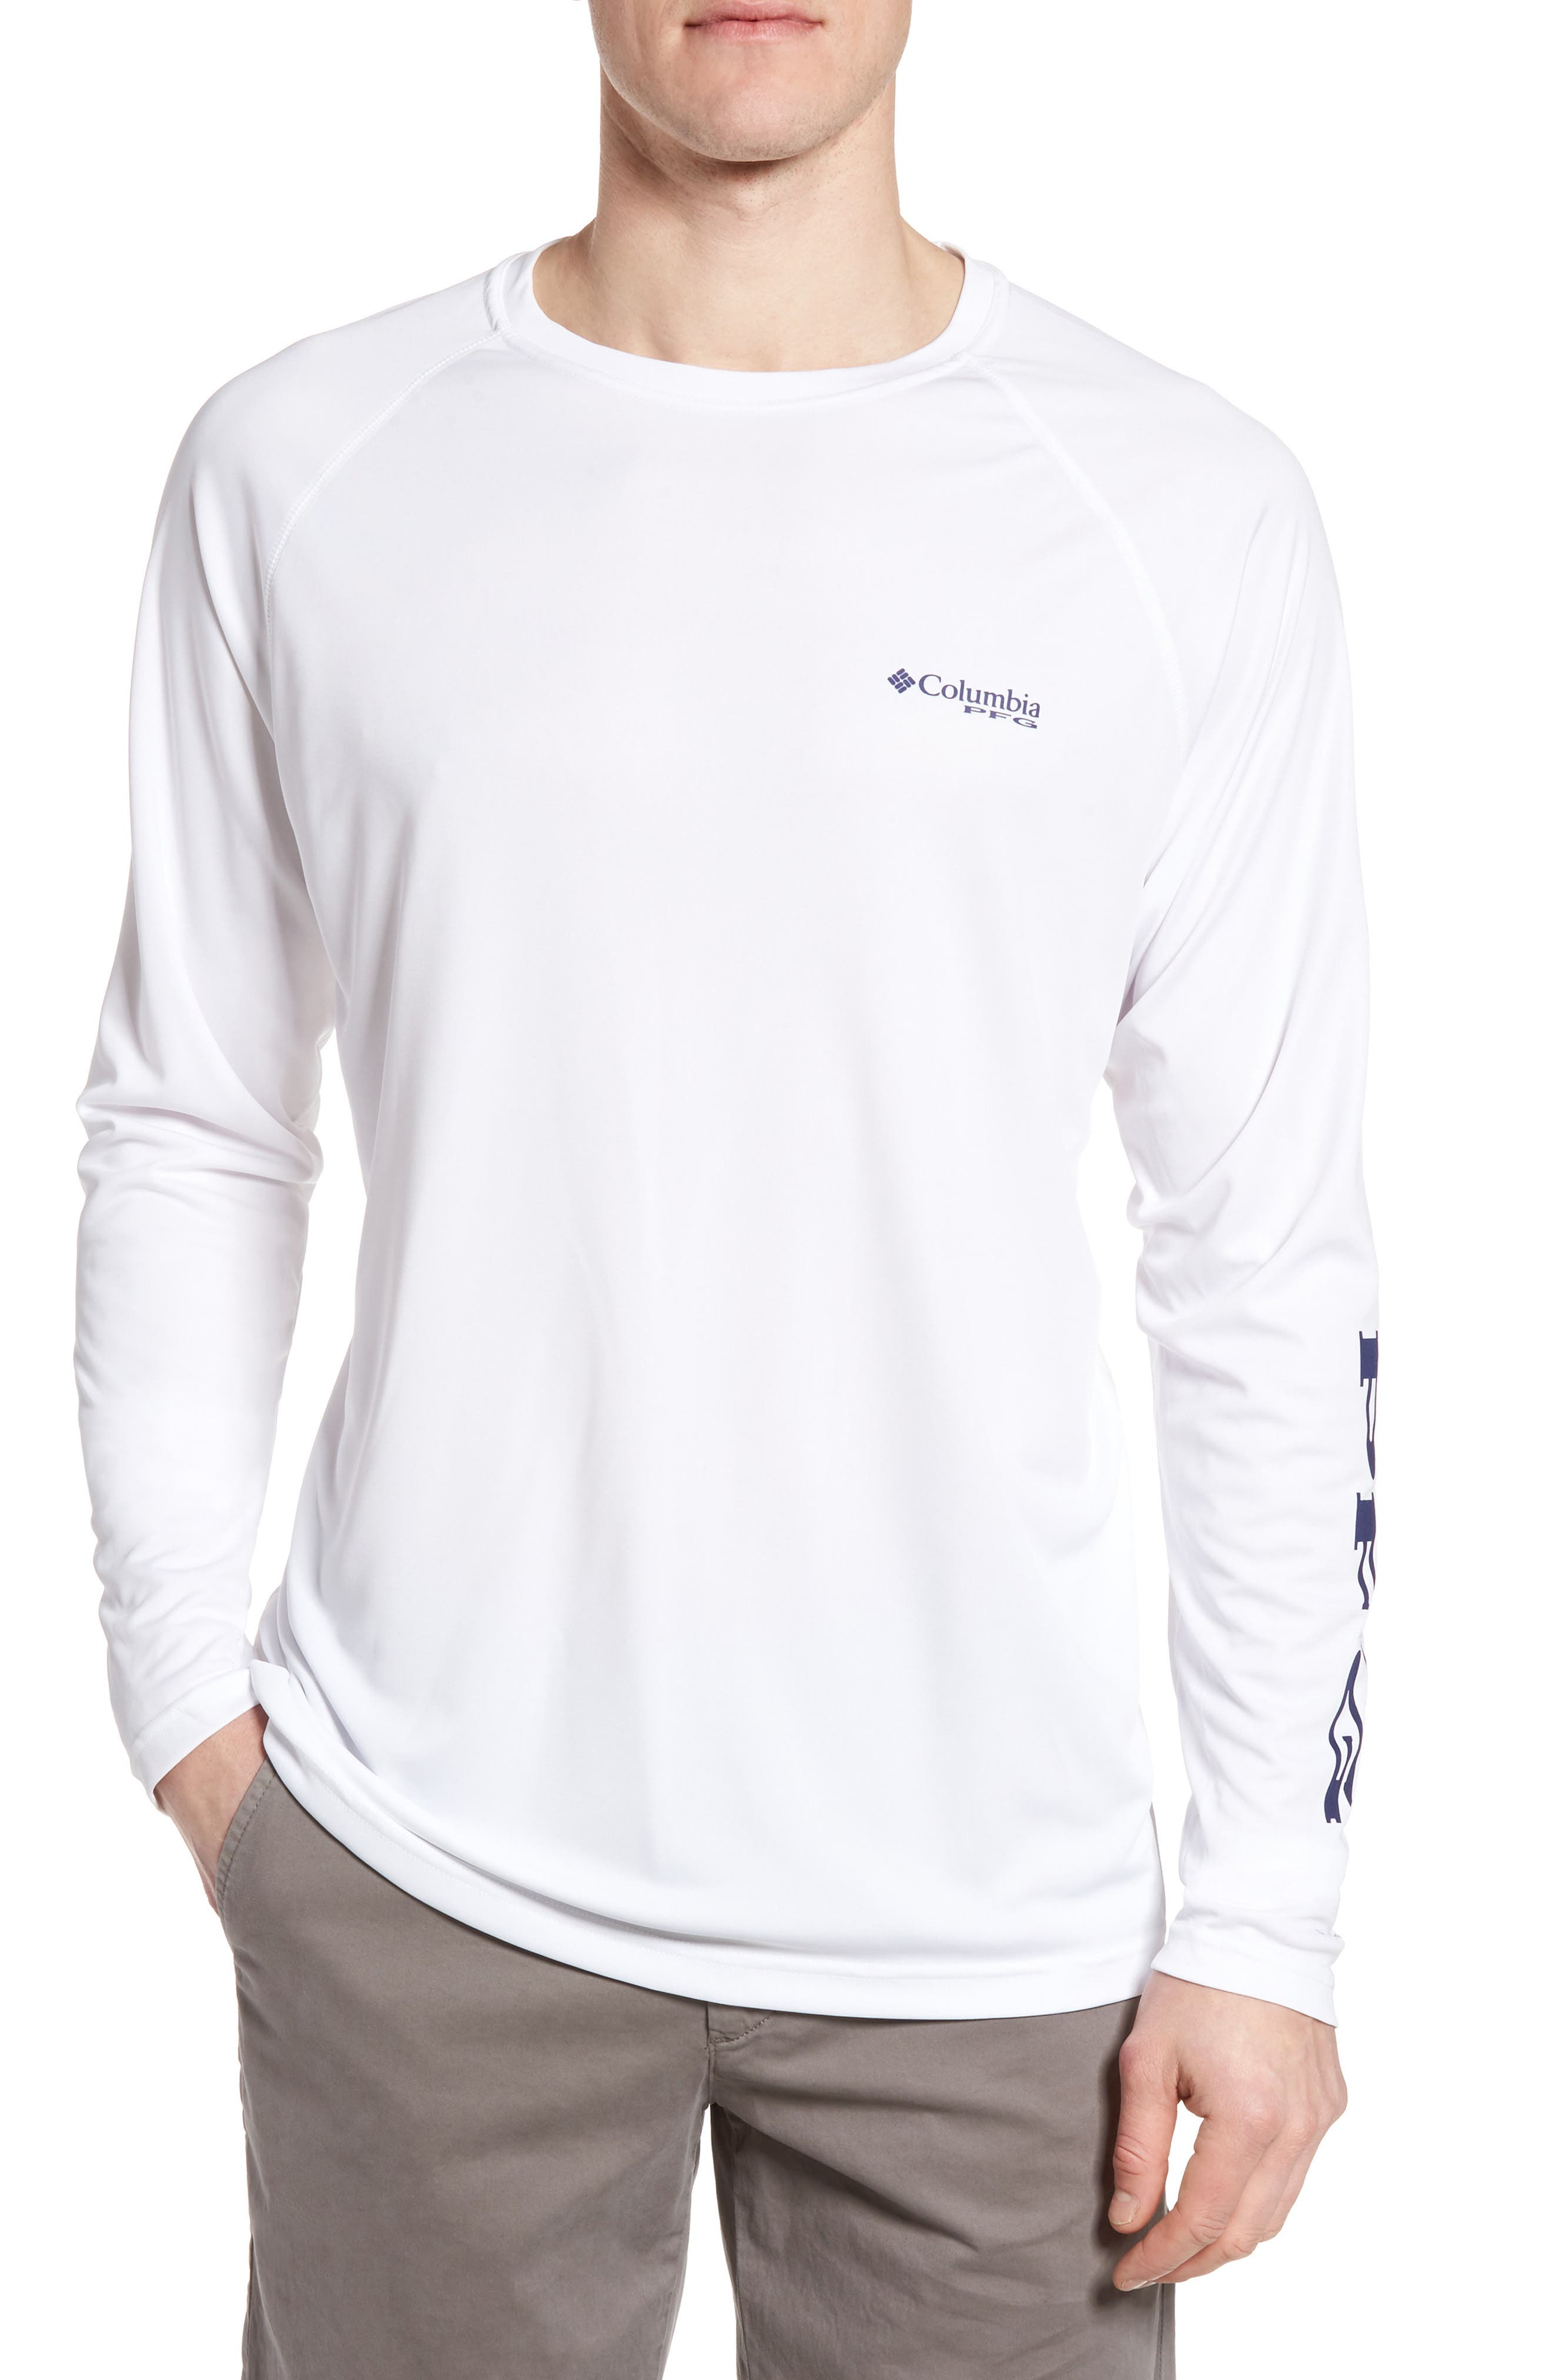 Columbia T-shirts PFG TERMINAL TACKLE PERFORMANCE LONG SLEEVE T-SHIRT